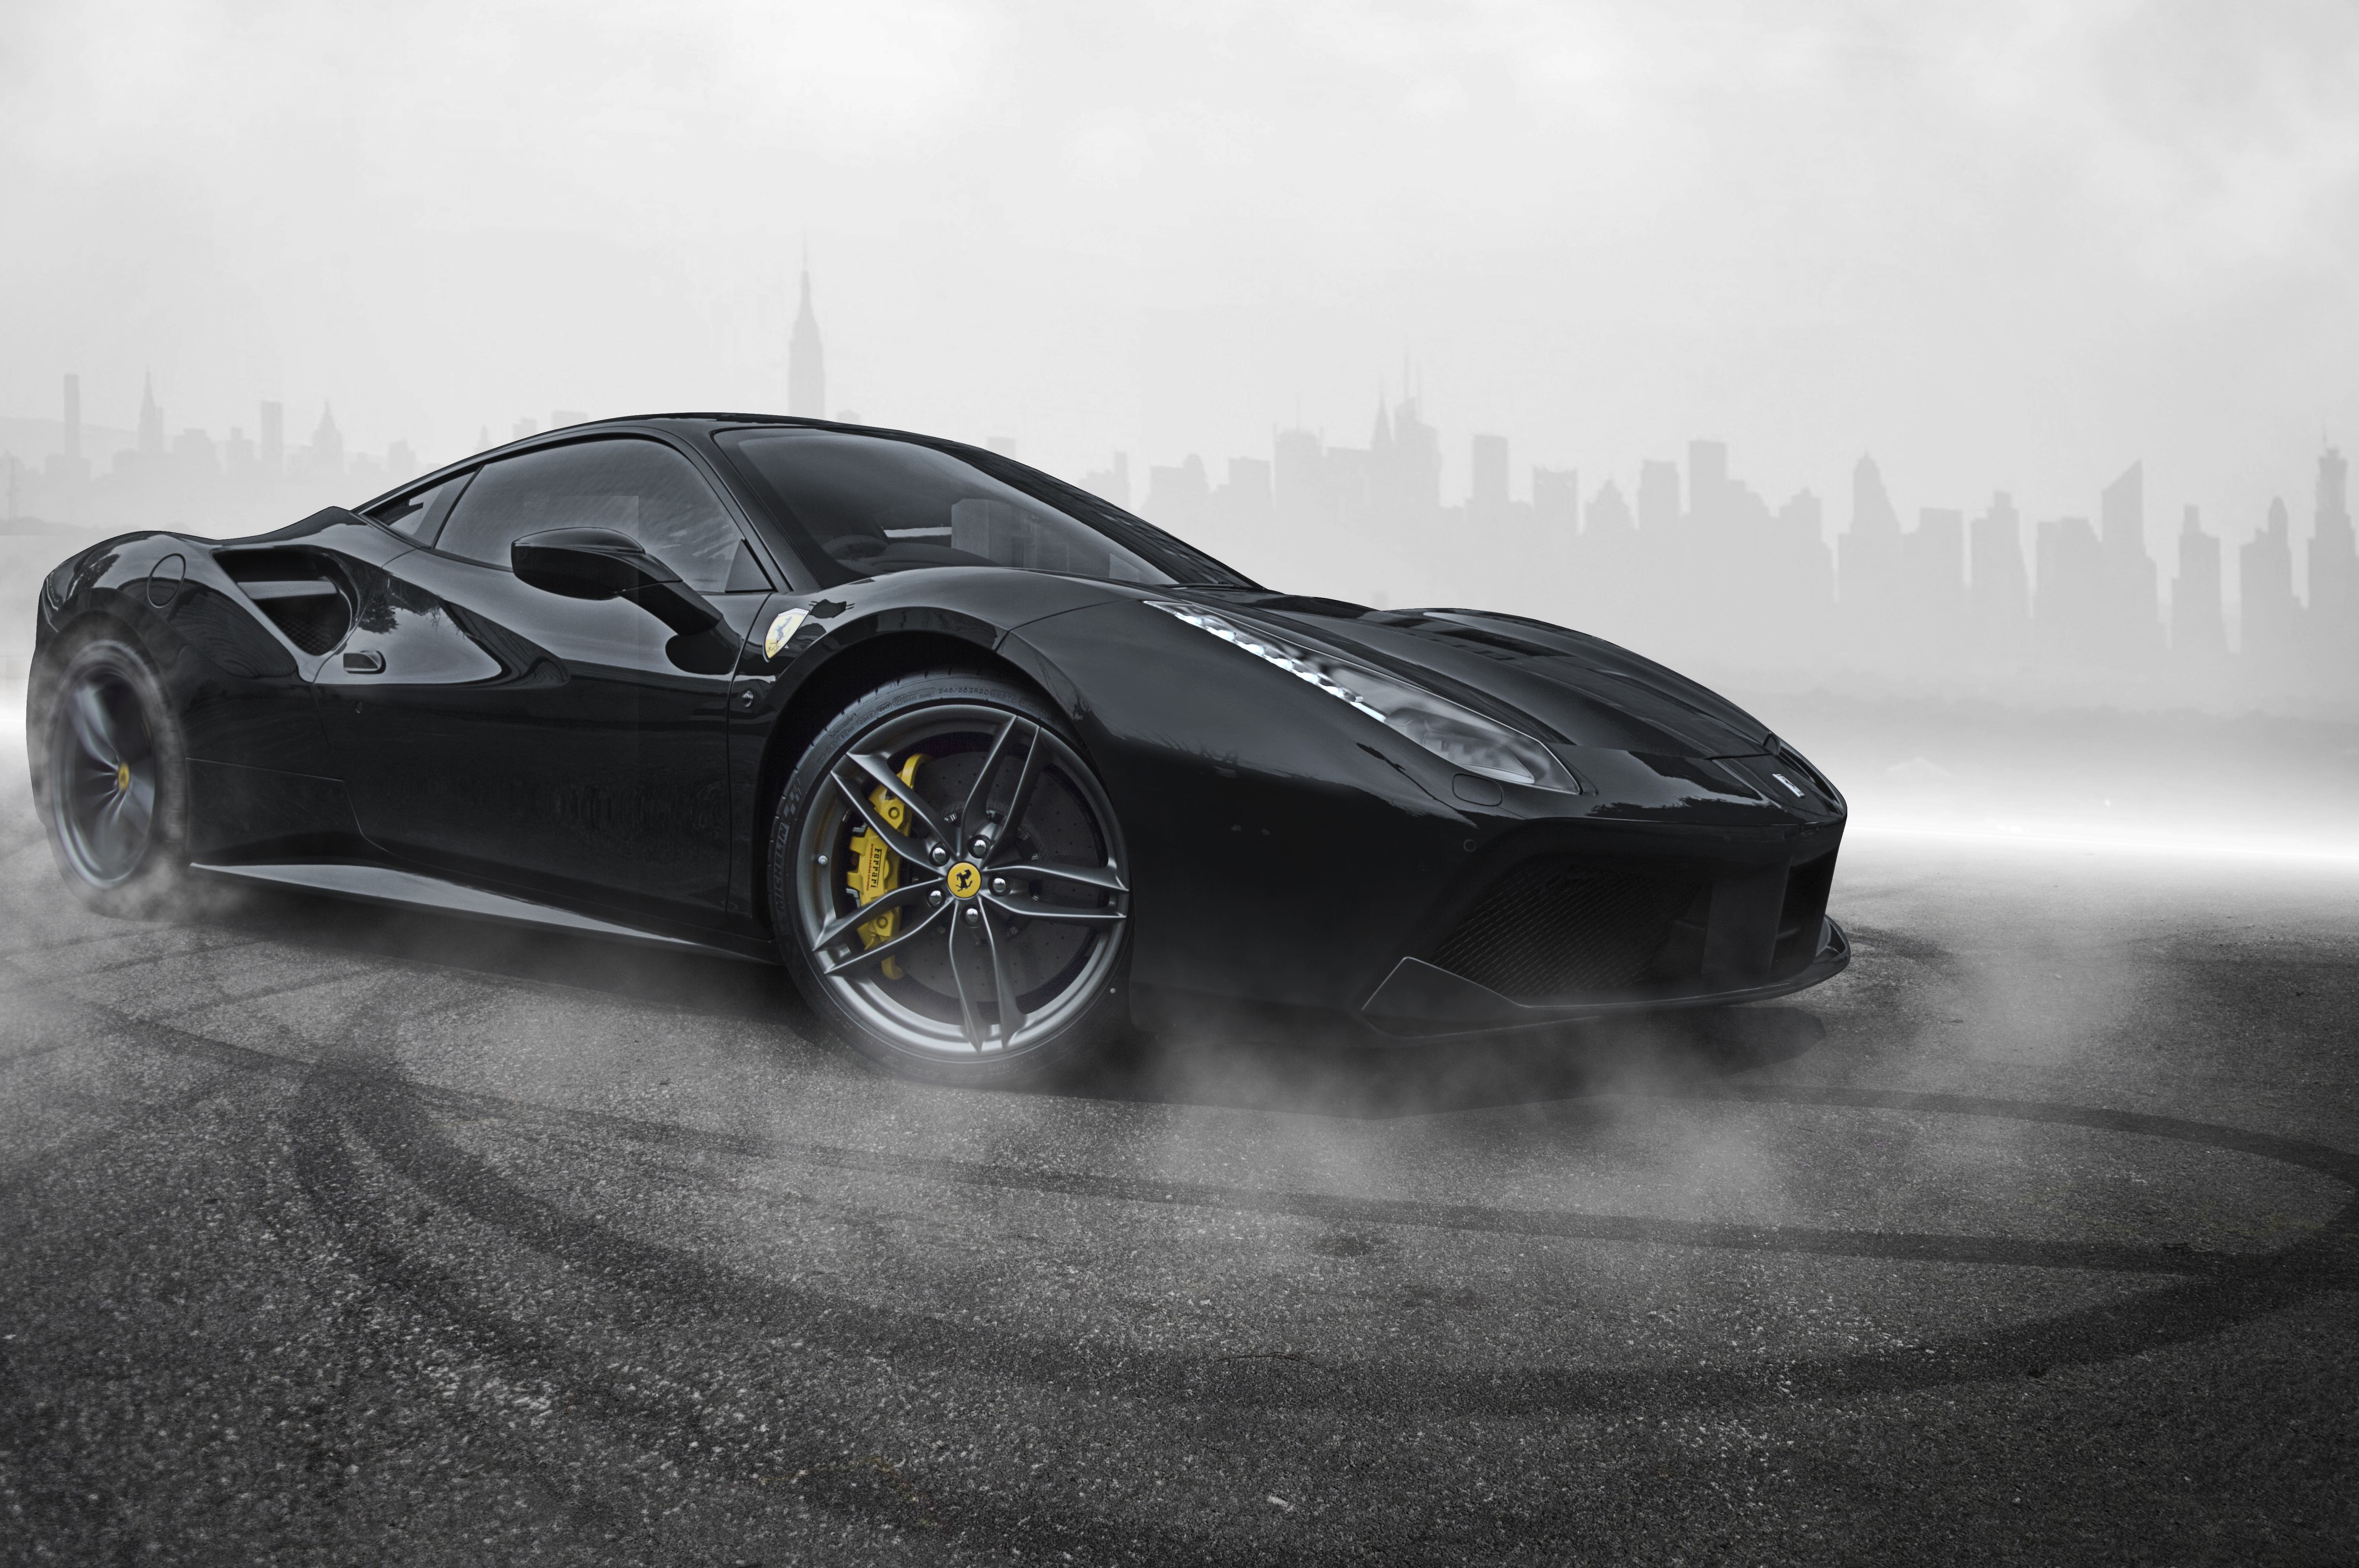 Black Ferrari 488 Wallpapers Top Free Black Ferrari 488 Backgrounds Wallpaperaccess